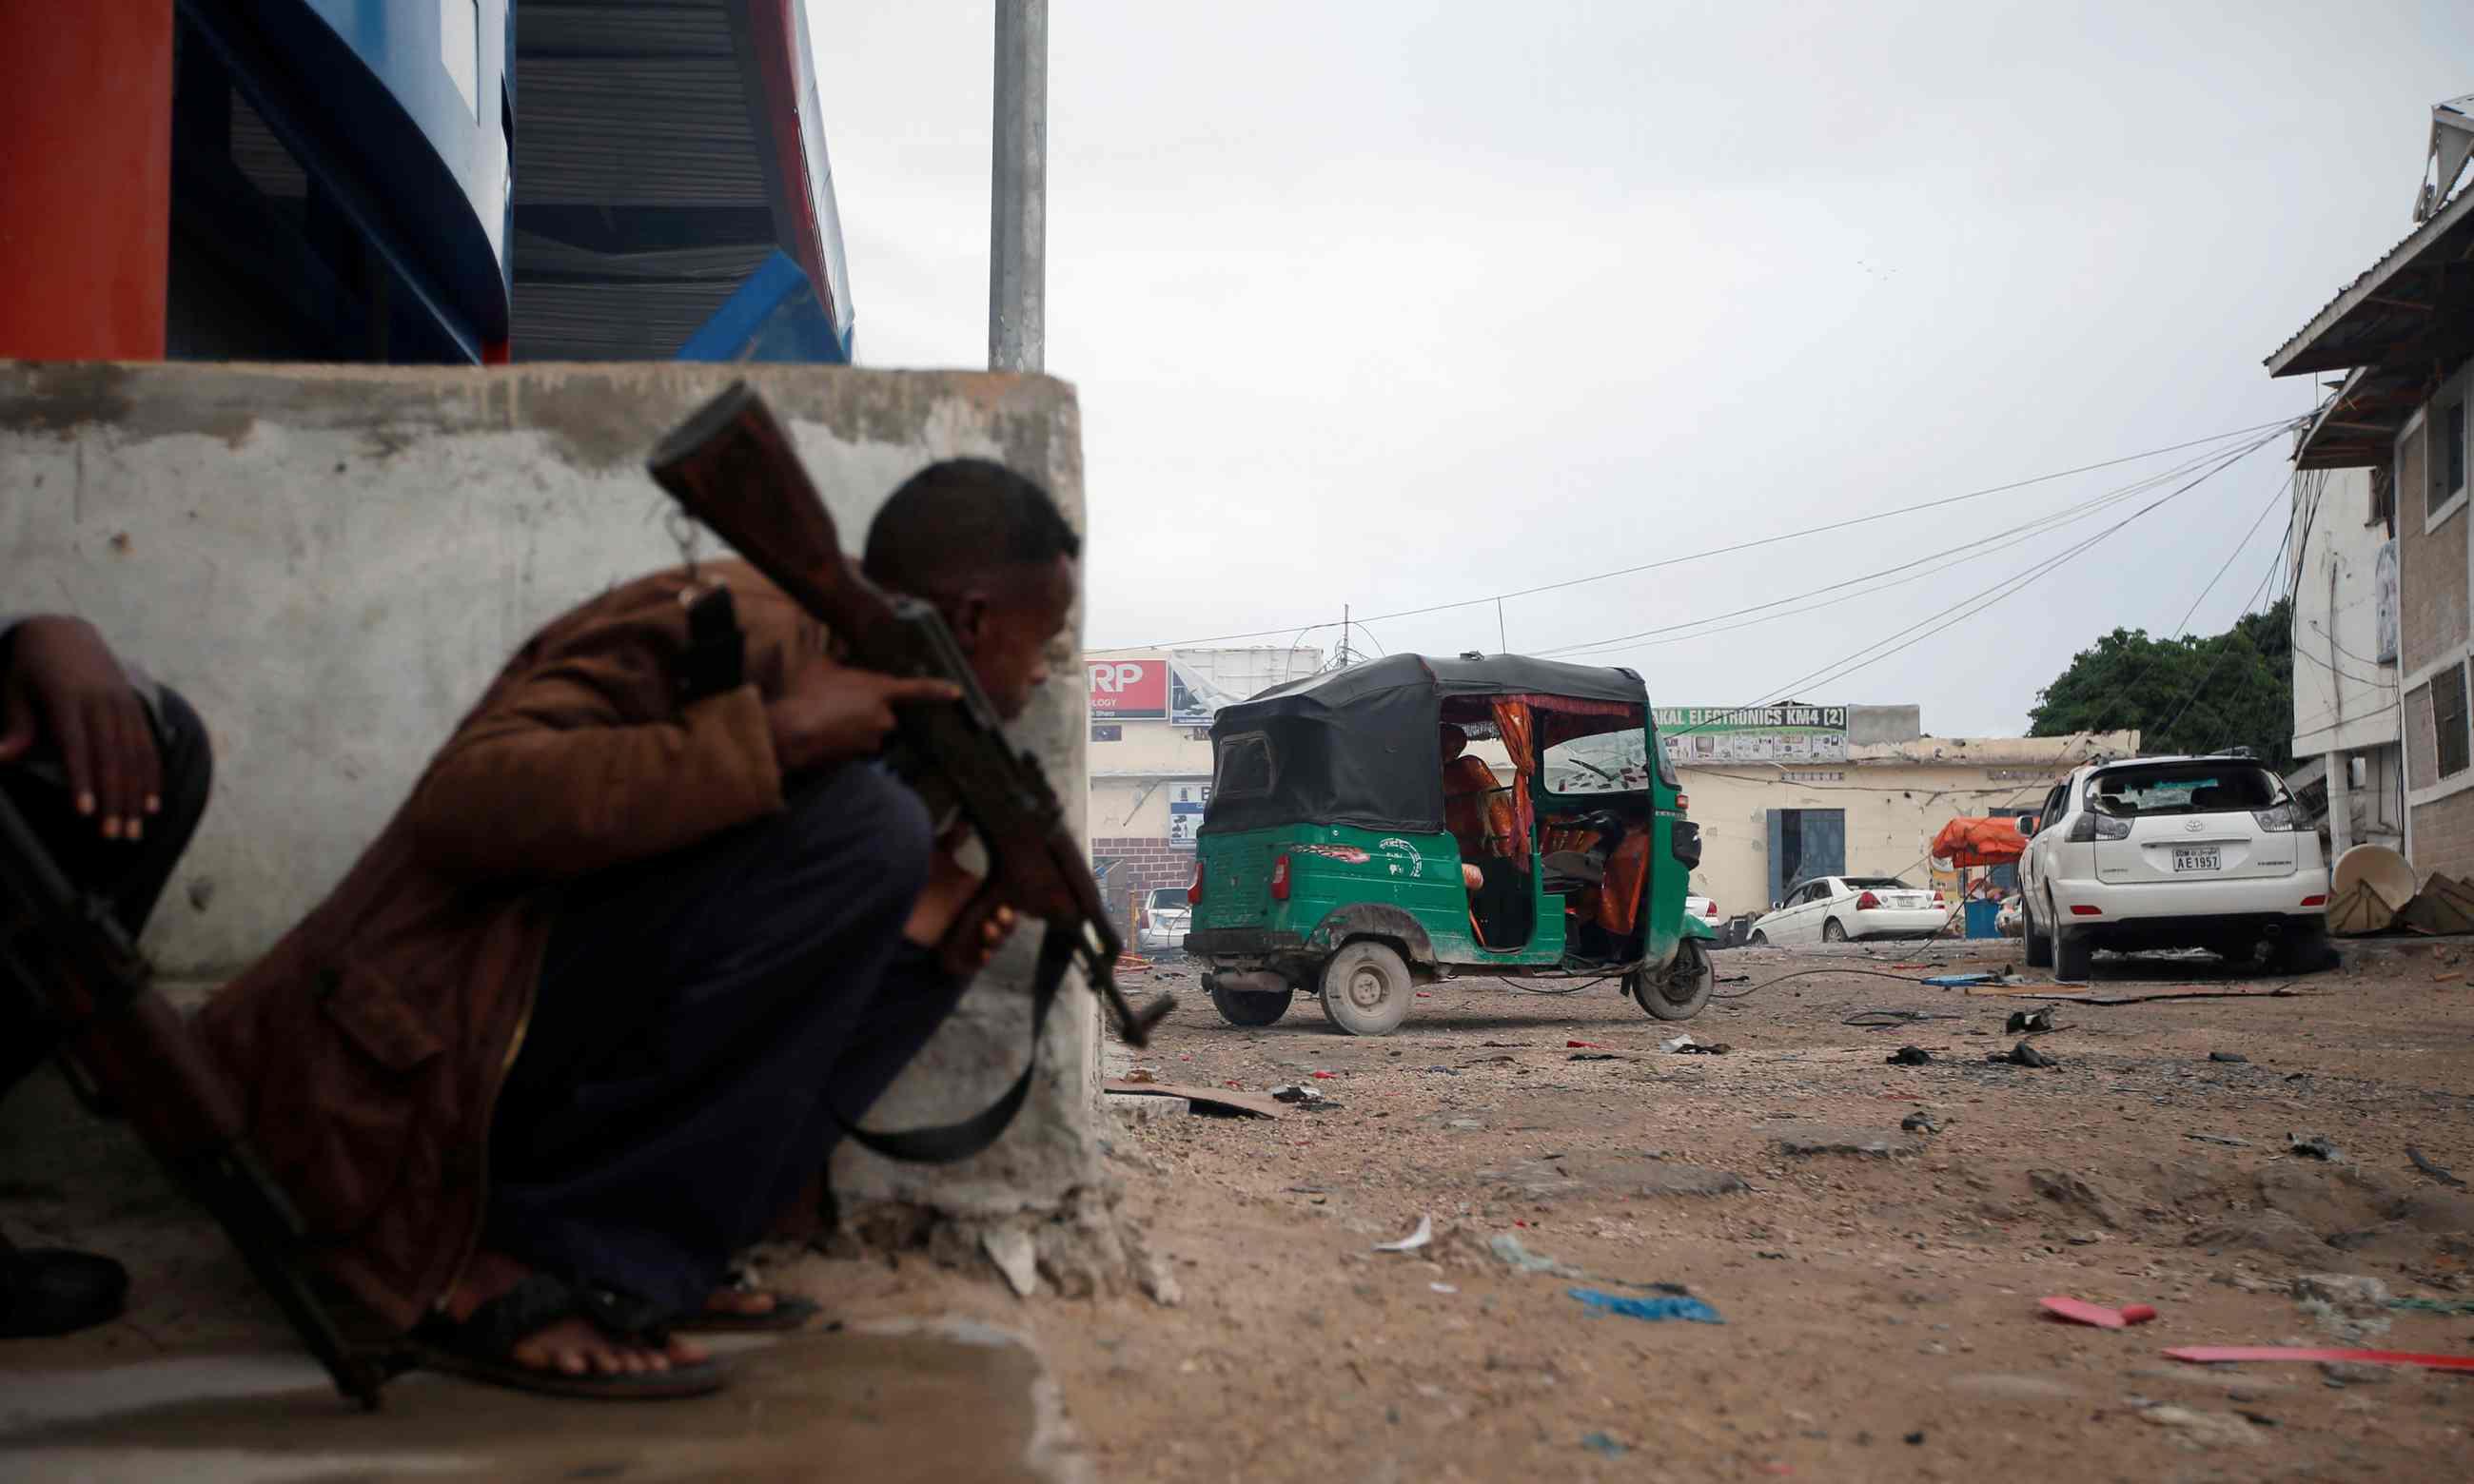 Foreign troops in Somalia struggle to keep al-Shabaab at bay